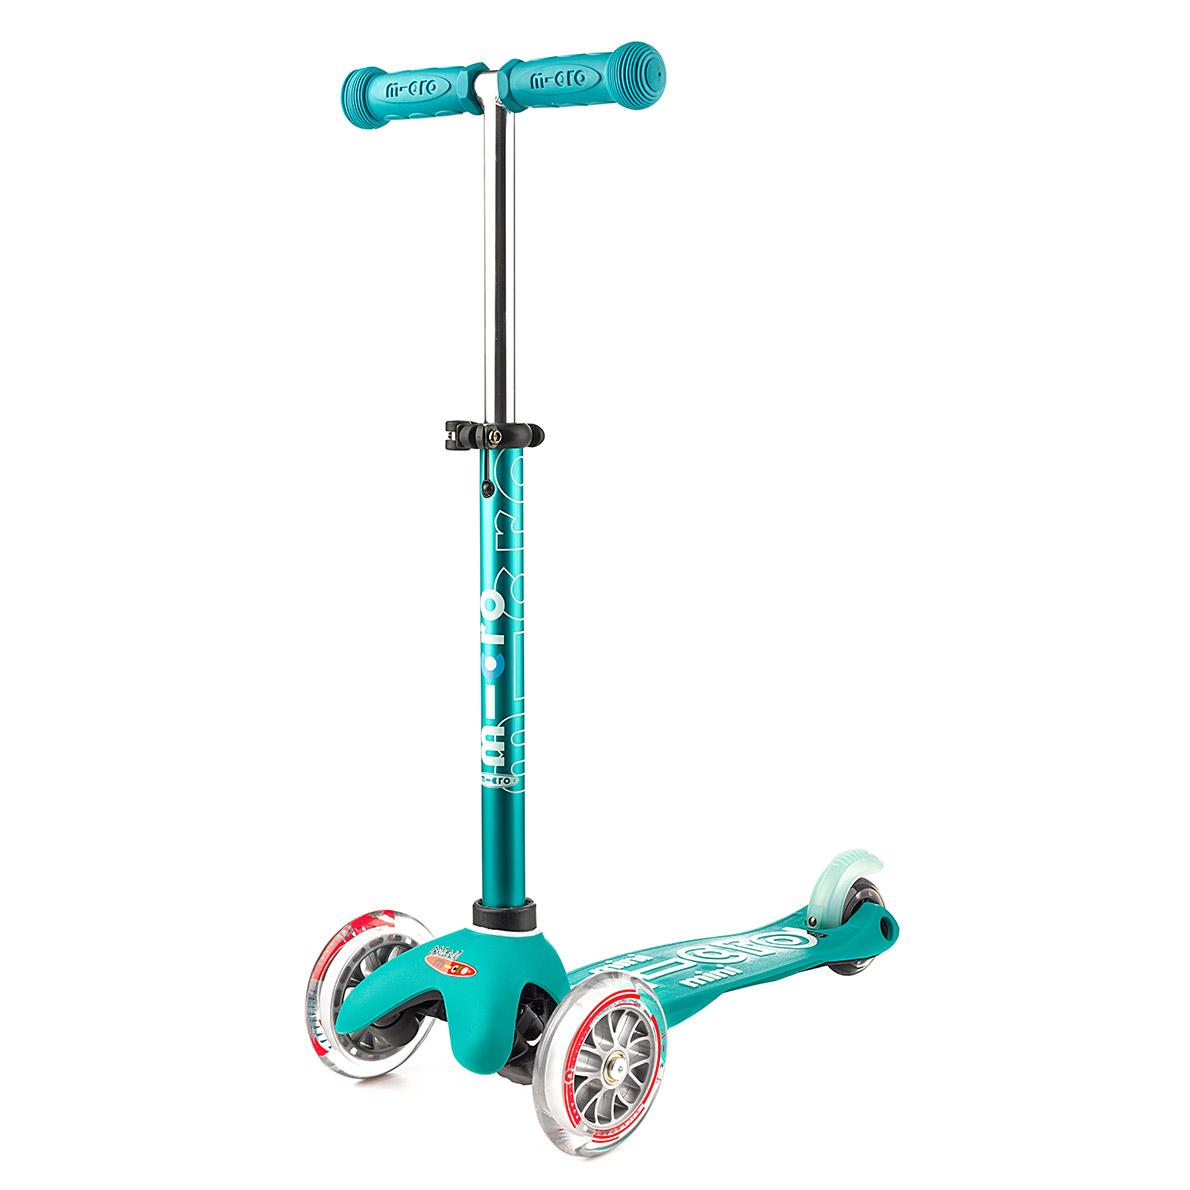 Cabinet Renewal Products: 【楽天市場】【マイクロスクーター・ジャパン】ミニ・マイクロ・デラックススクーター マイクロキックボード キック